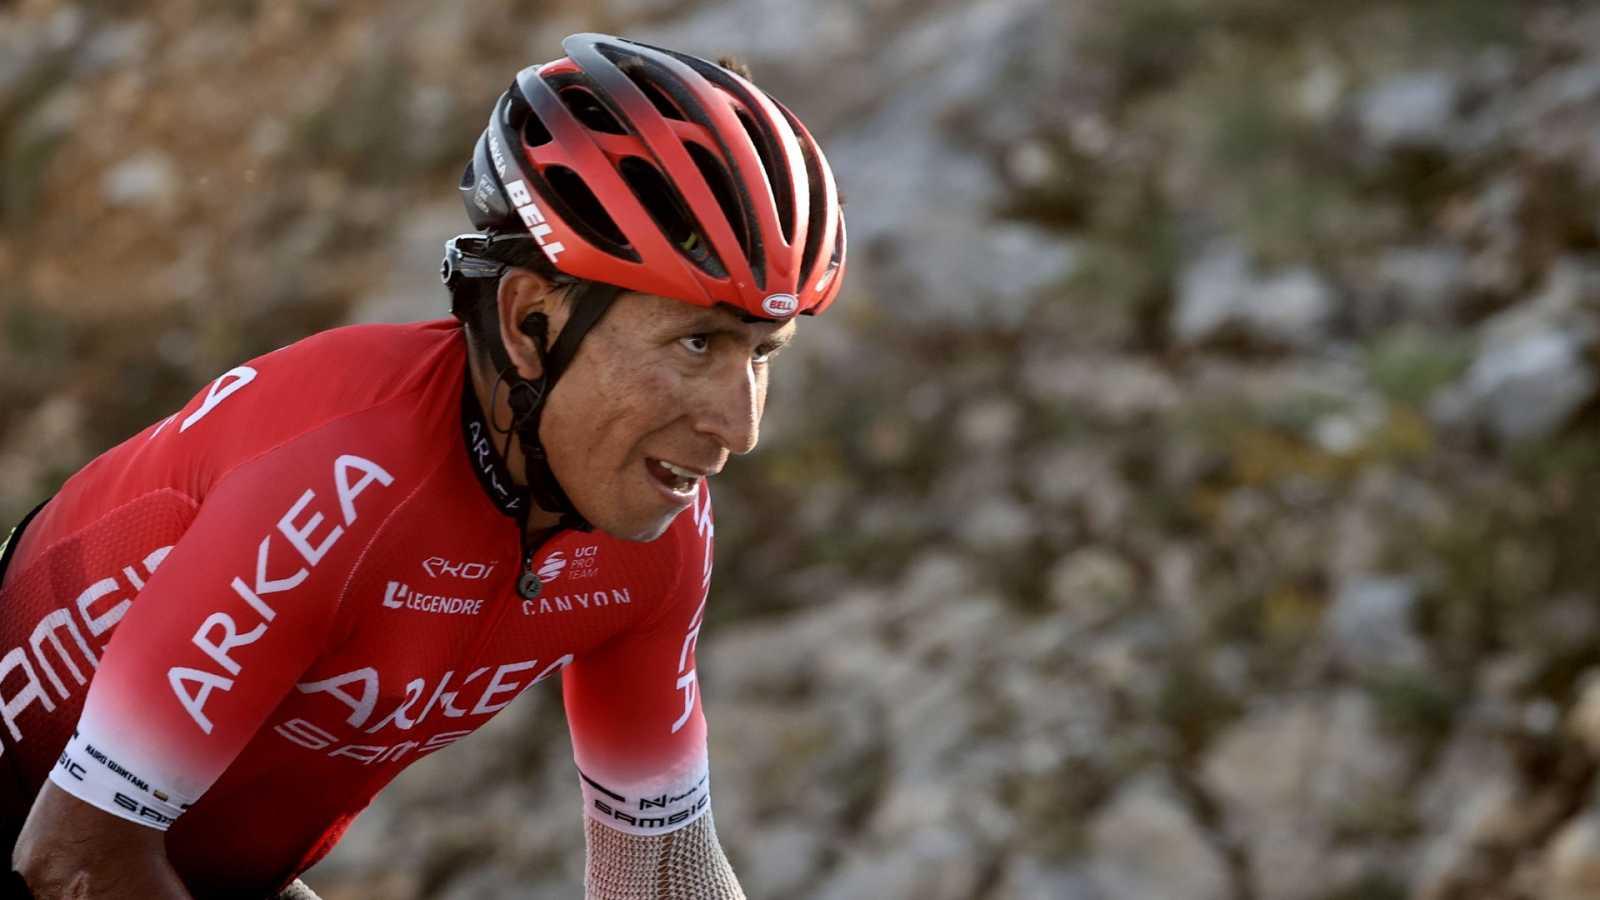 Nairo Quintana, ciclista colombiano, durante la etapa 15 del Tour de Francia 2020